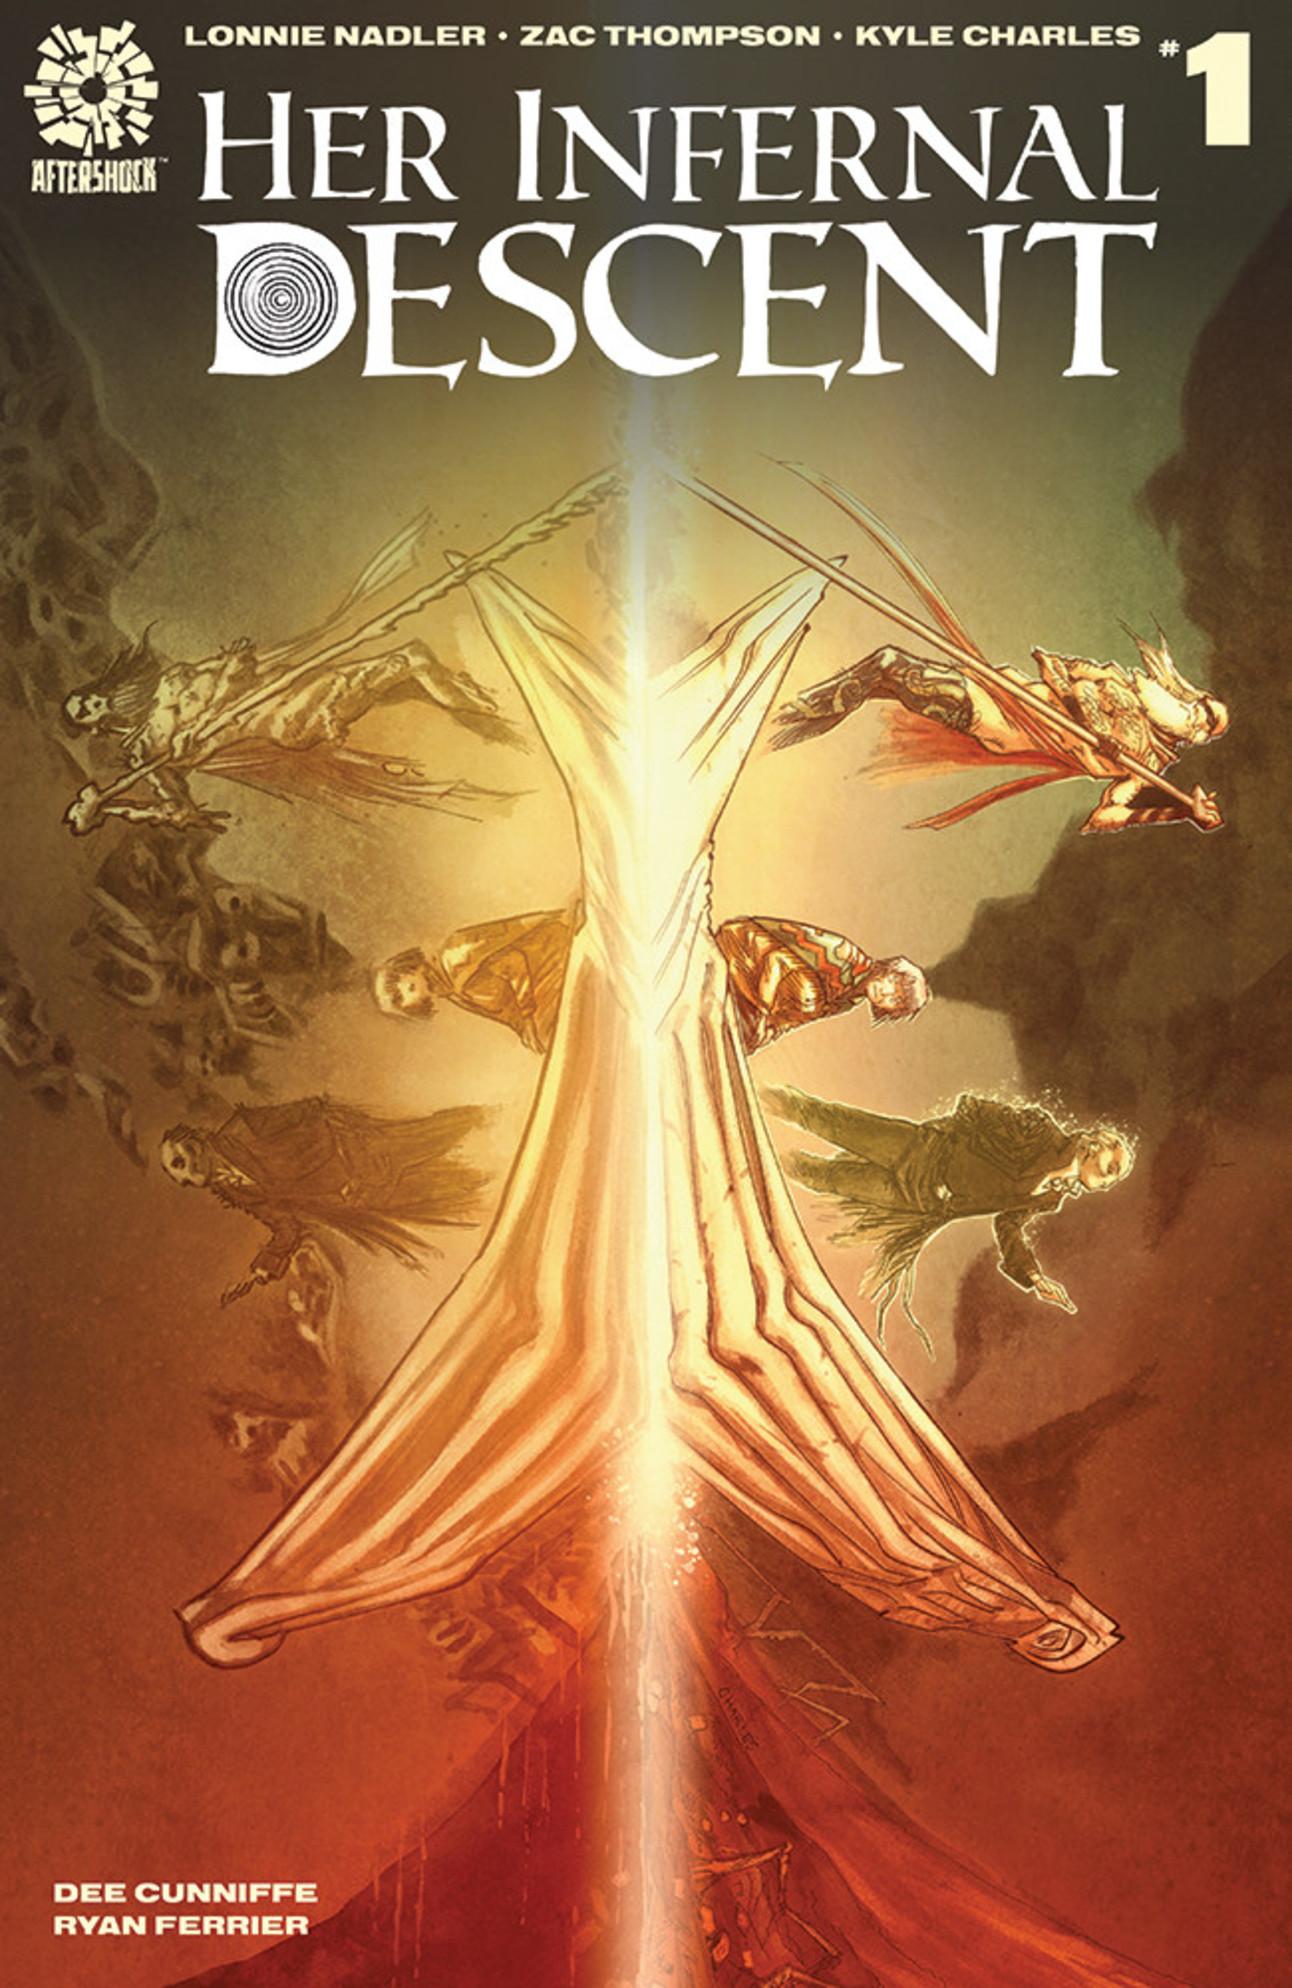 Her Infernal Descent #1 Cover A